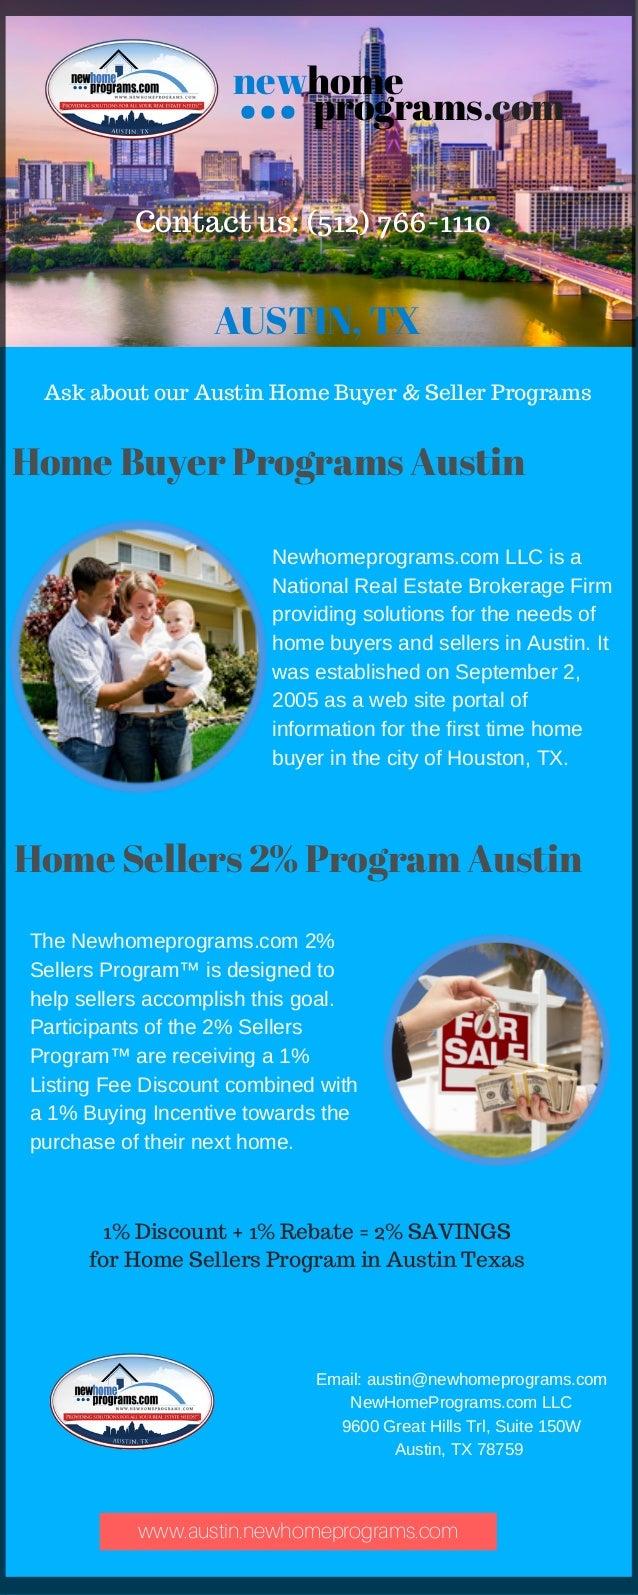 First Time New Home Buyer Program - Austin, TX